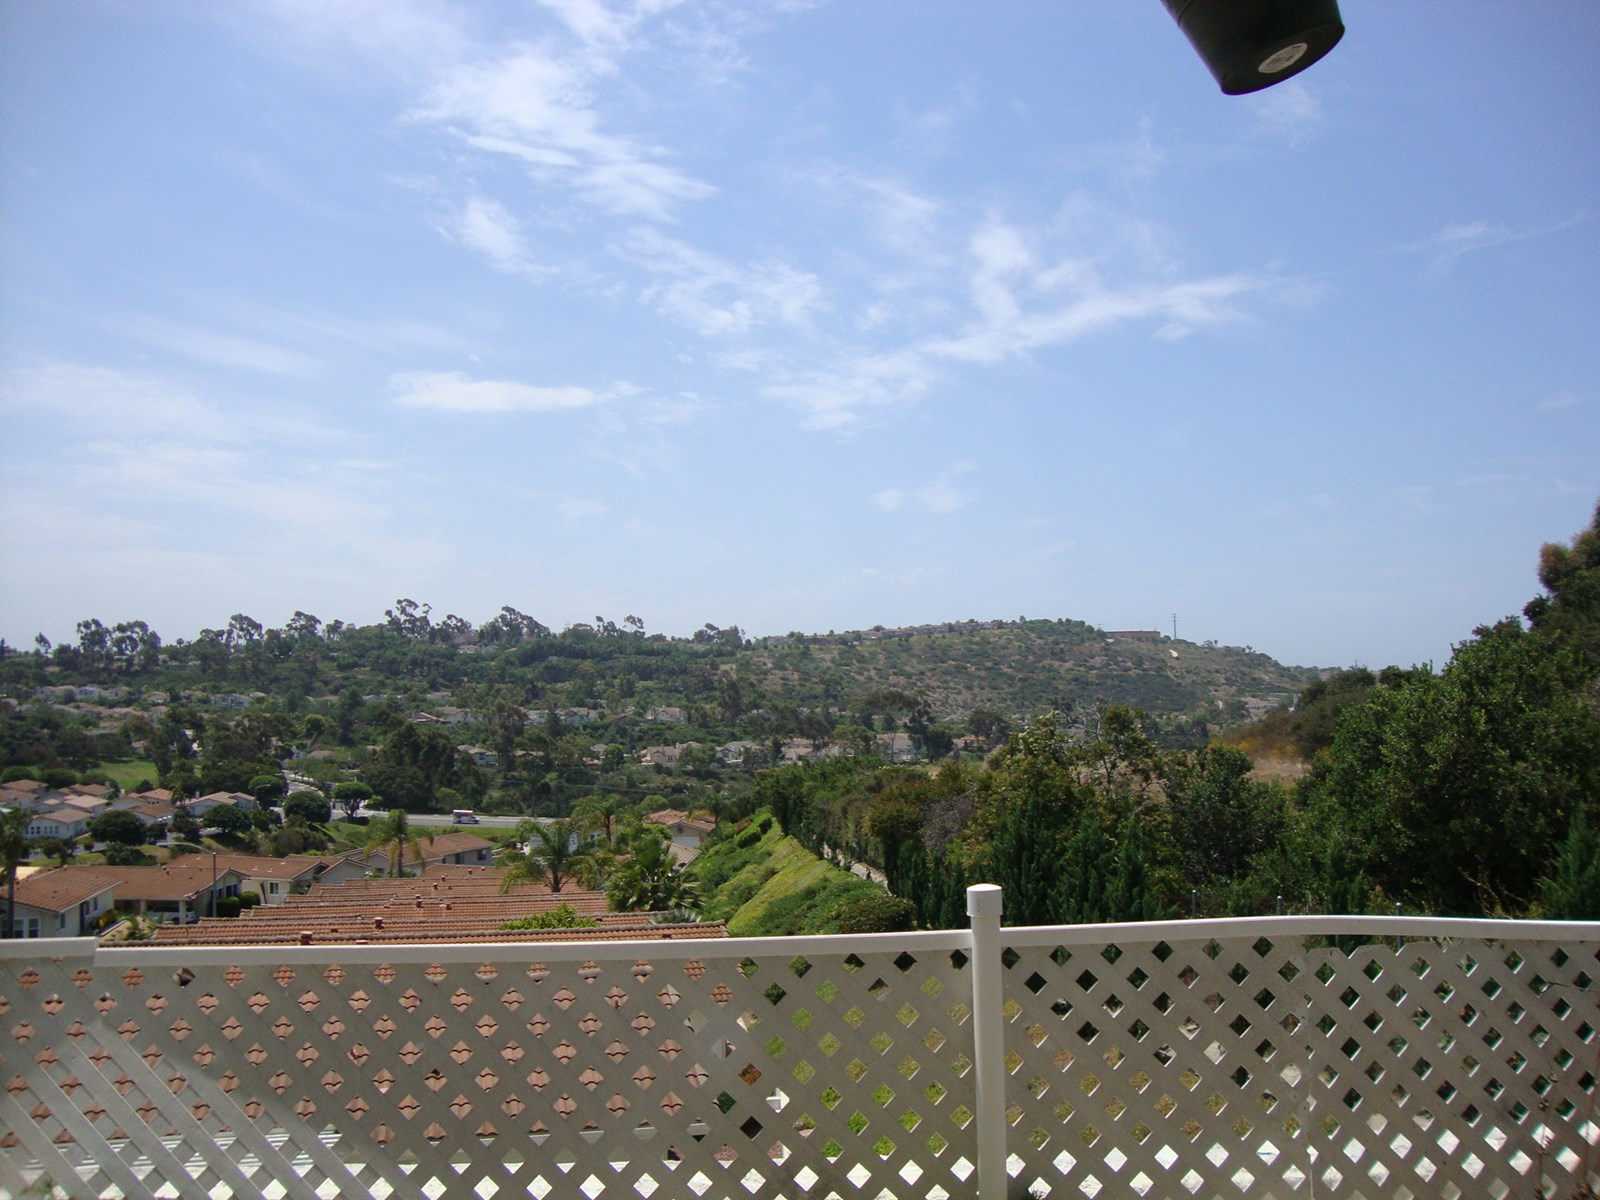 So California San Diego County San Marcos 55+ community Home